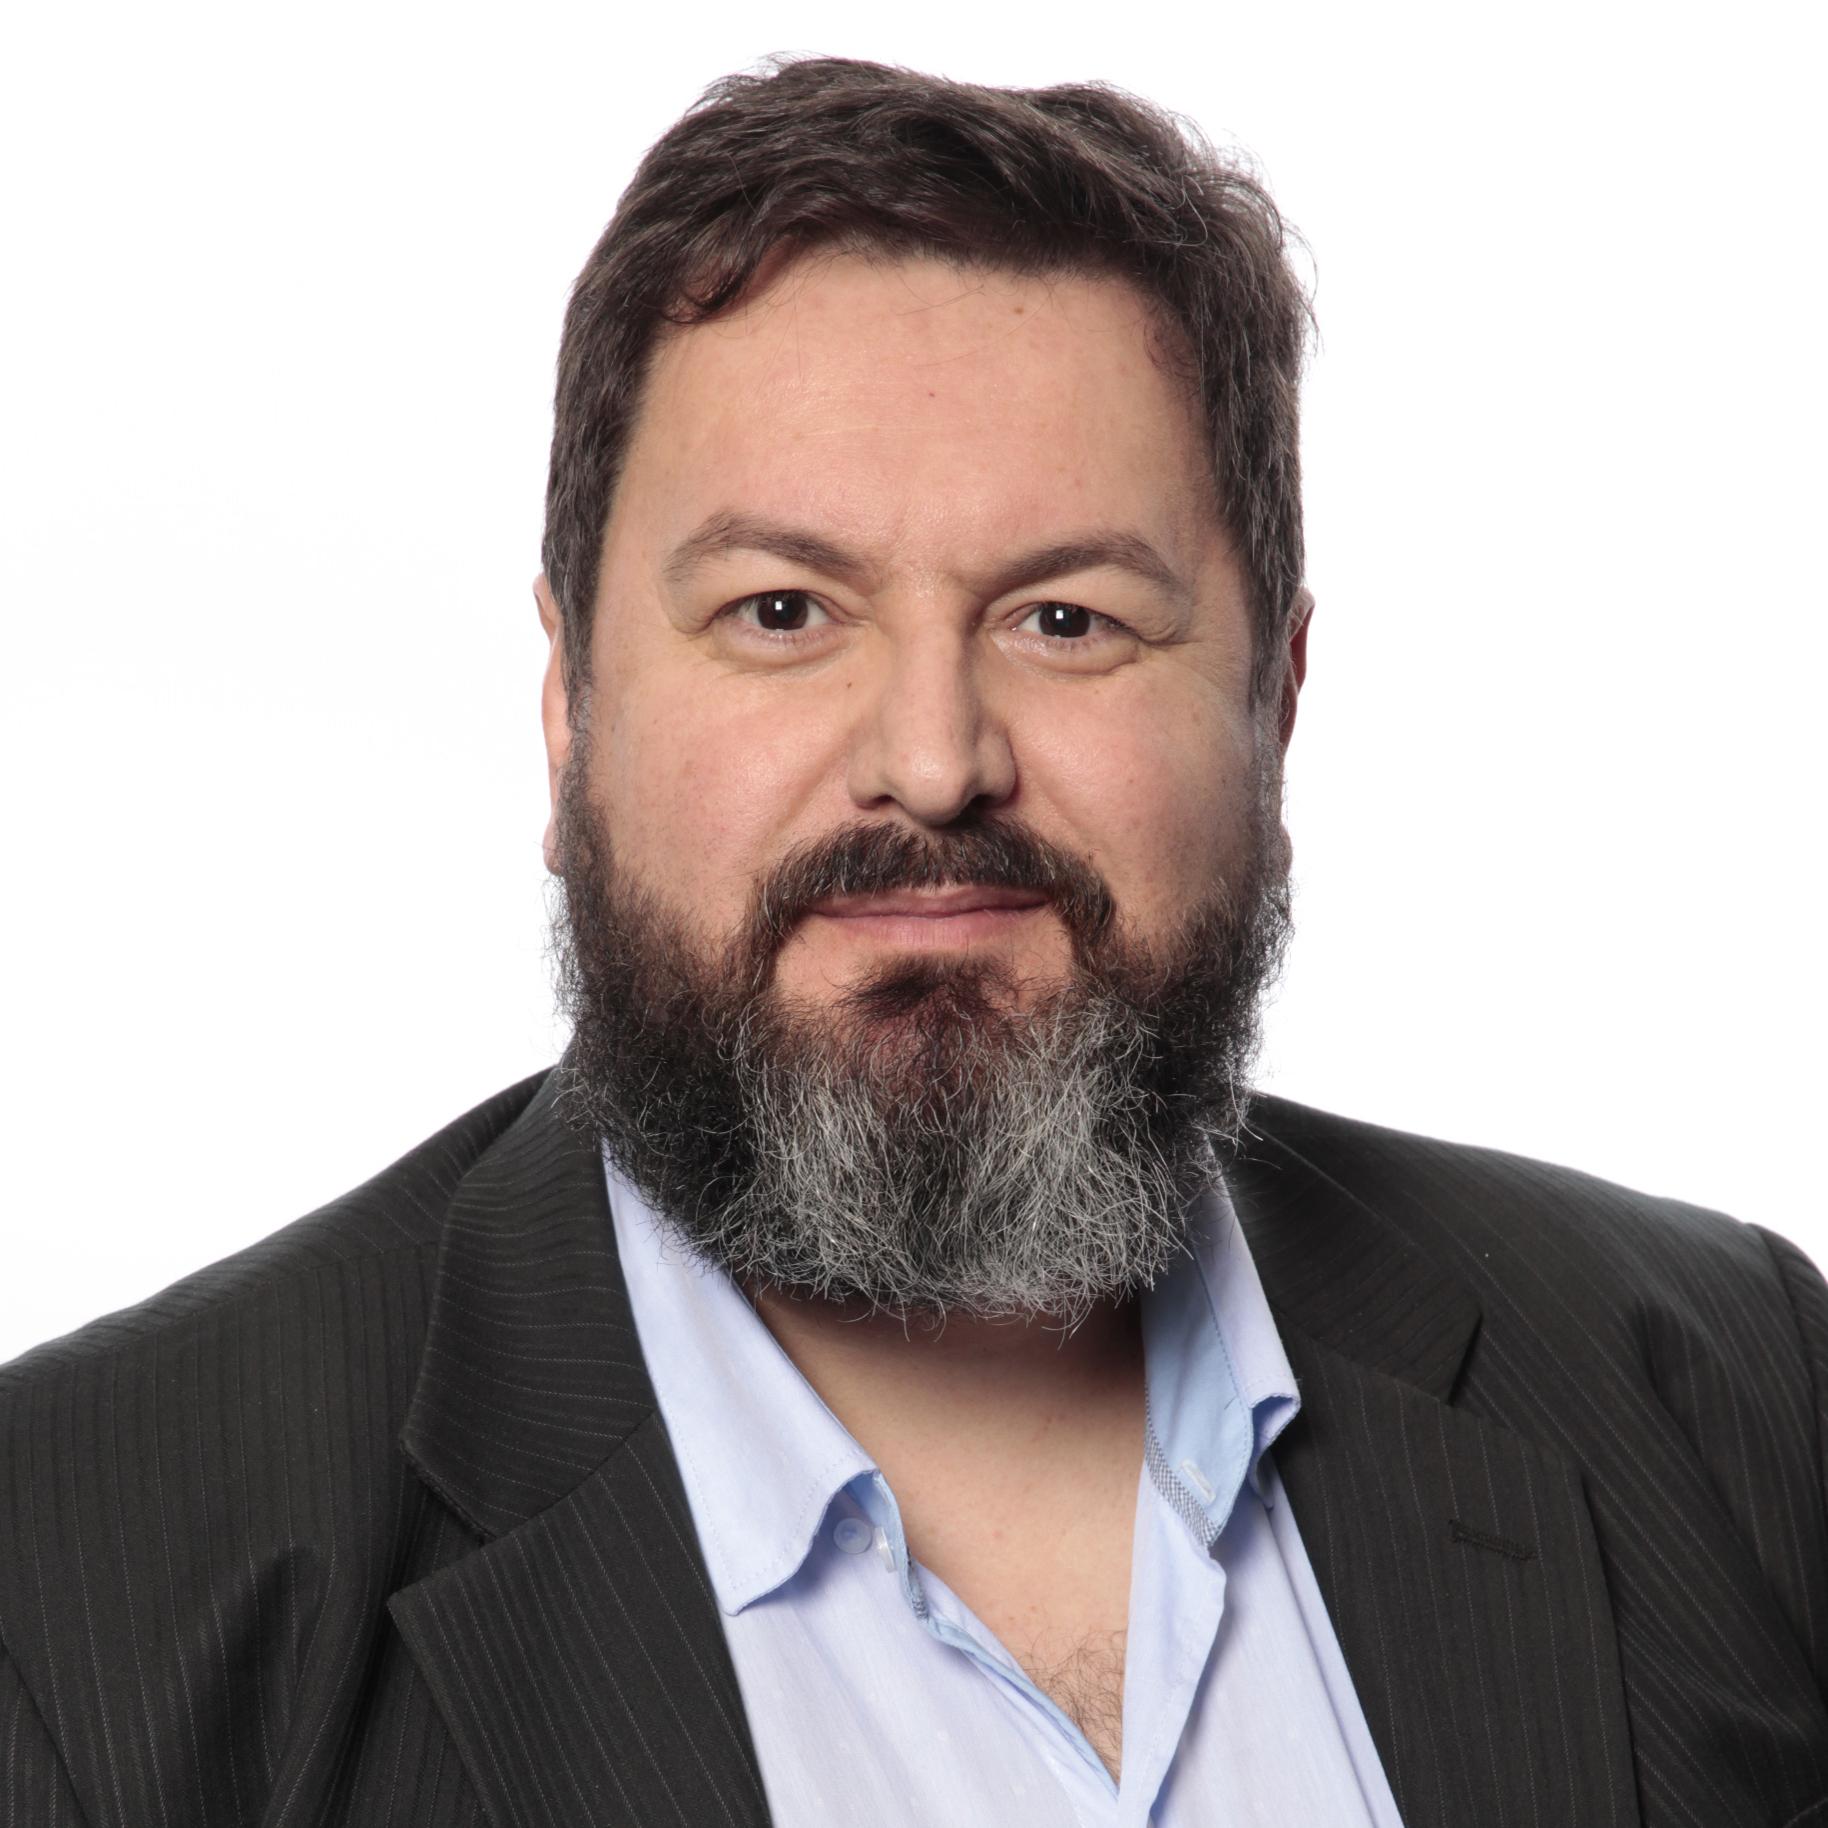 Jose Tavares